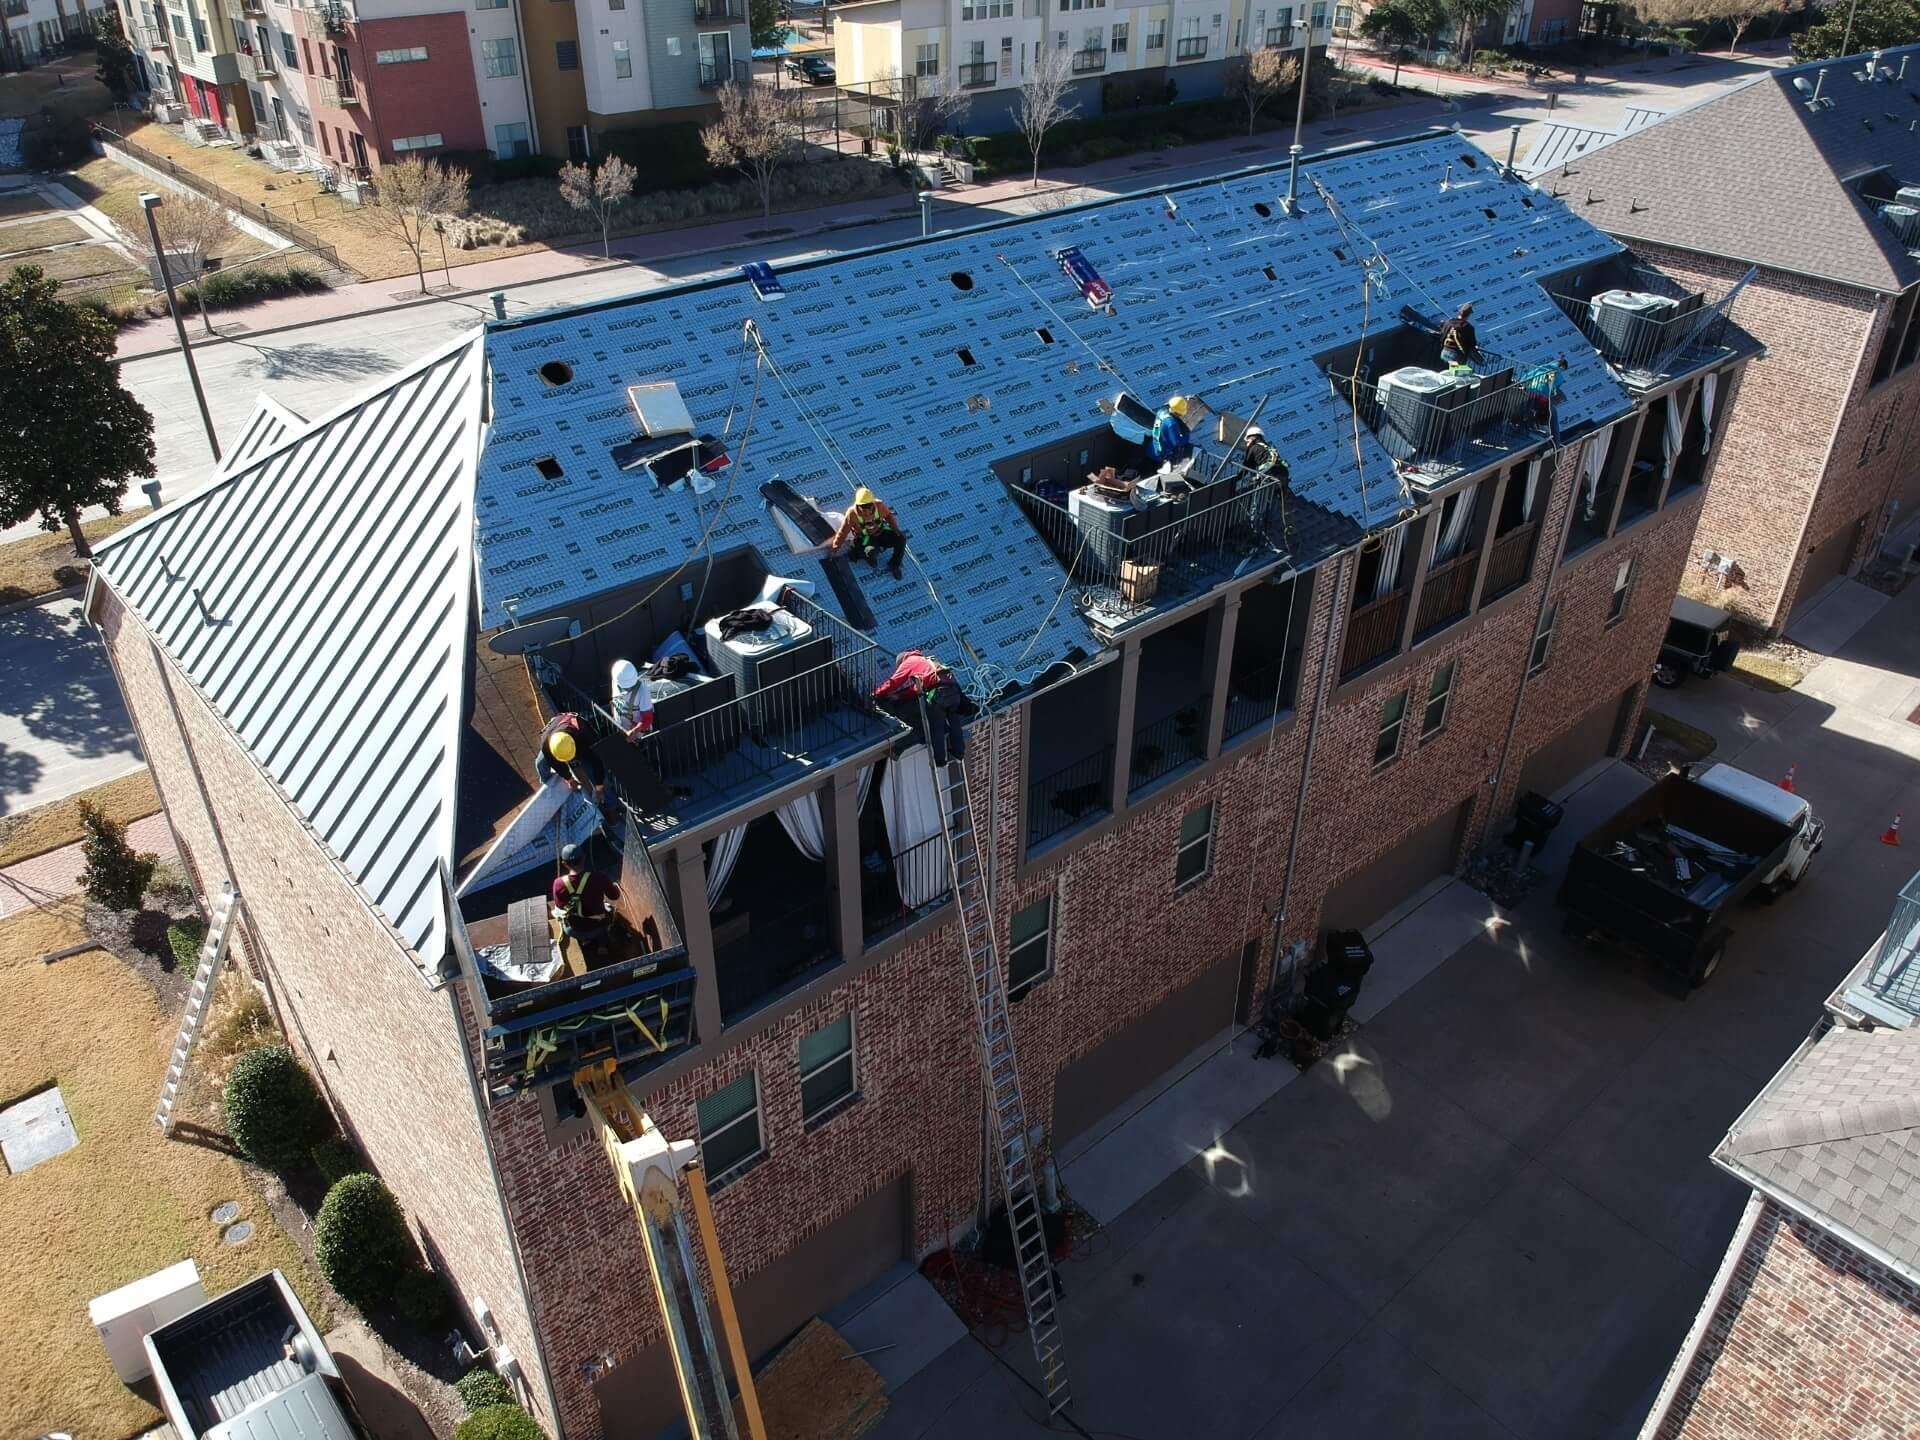 commercial roofer denver co tpo flat epdm roof repair free inspection best companies near me services denver commercial roofing company image4